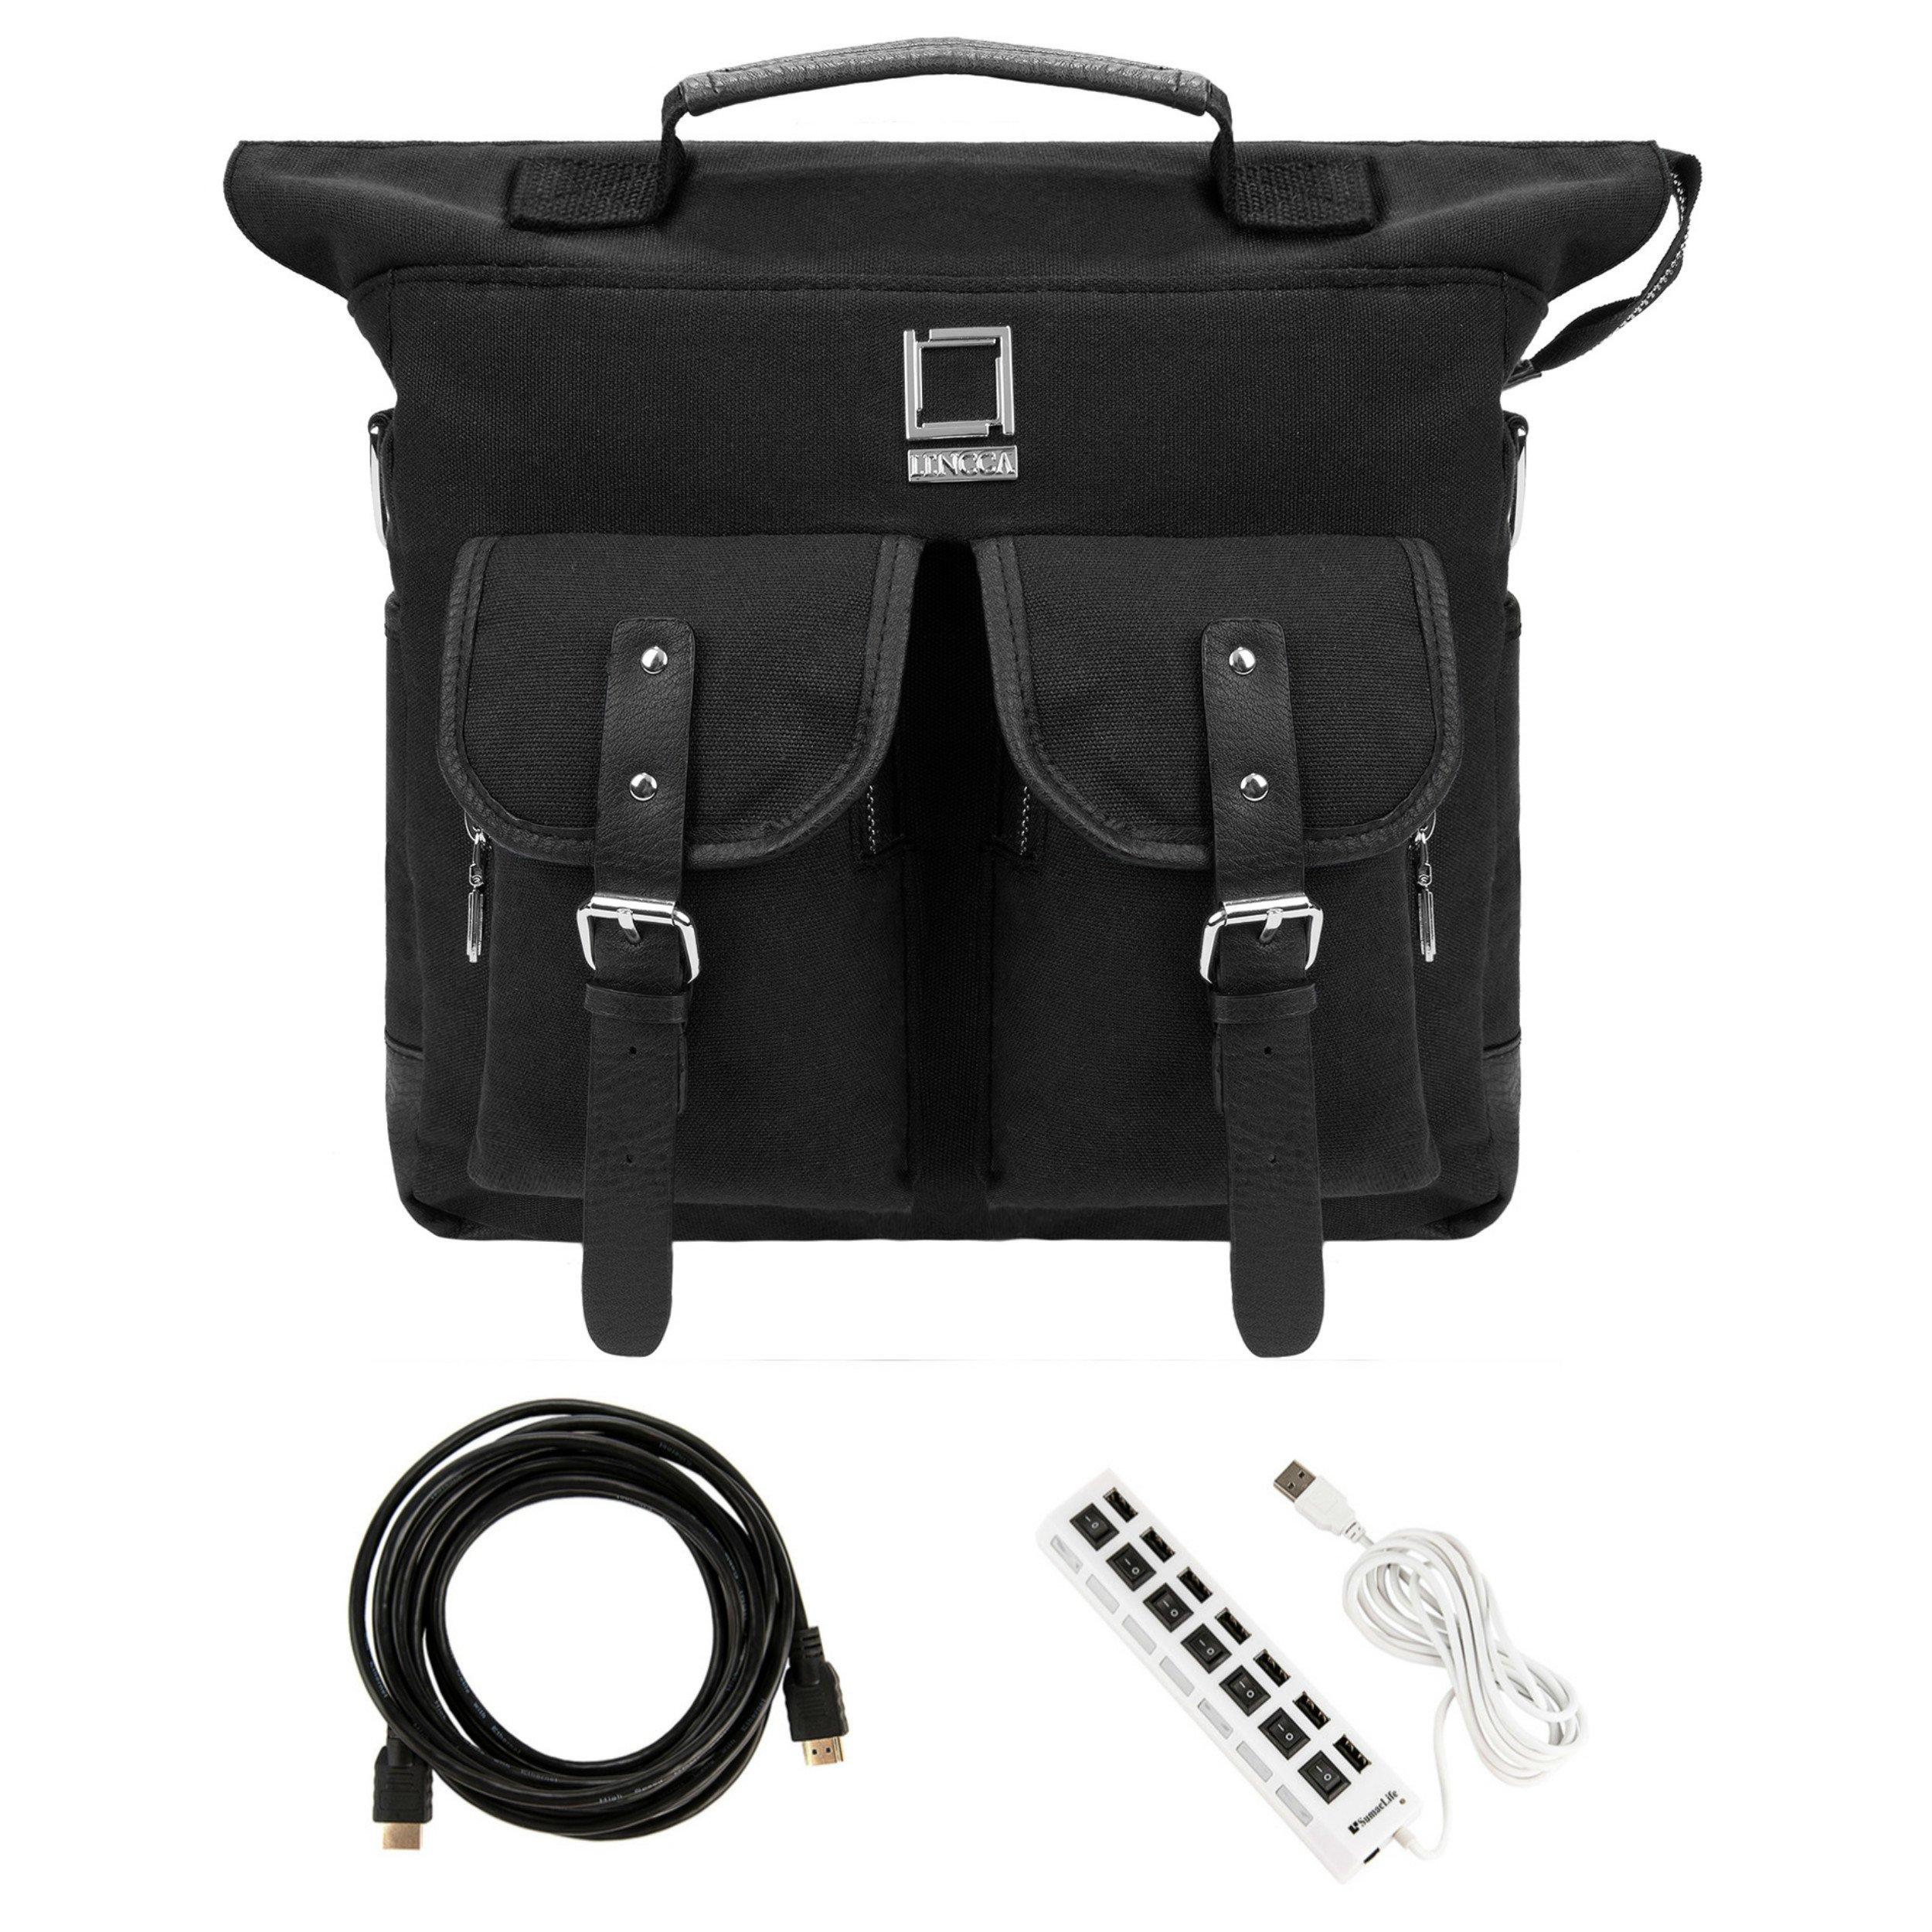 Lencca Durable Shock-proof Canvas Backpack Duffle Hybrid Bag Laptop Handle Case For Fujitsu 11.6'' Tablet Computer Black & 7 Port HUB & 8ft USB Cable